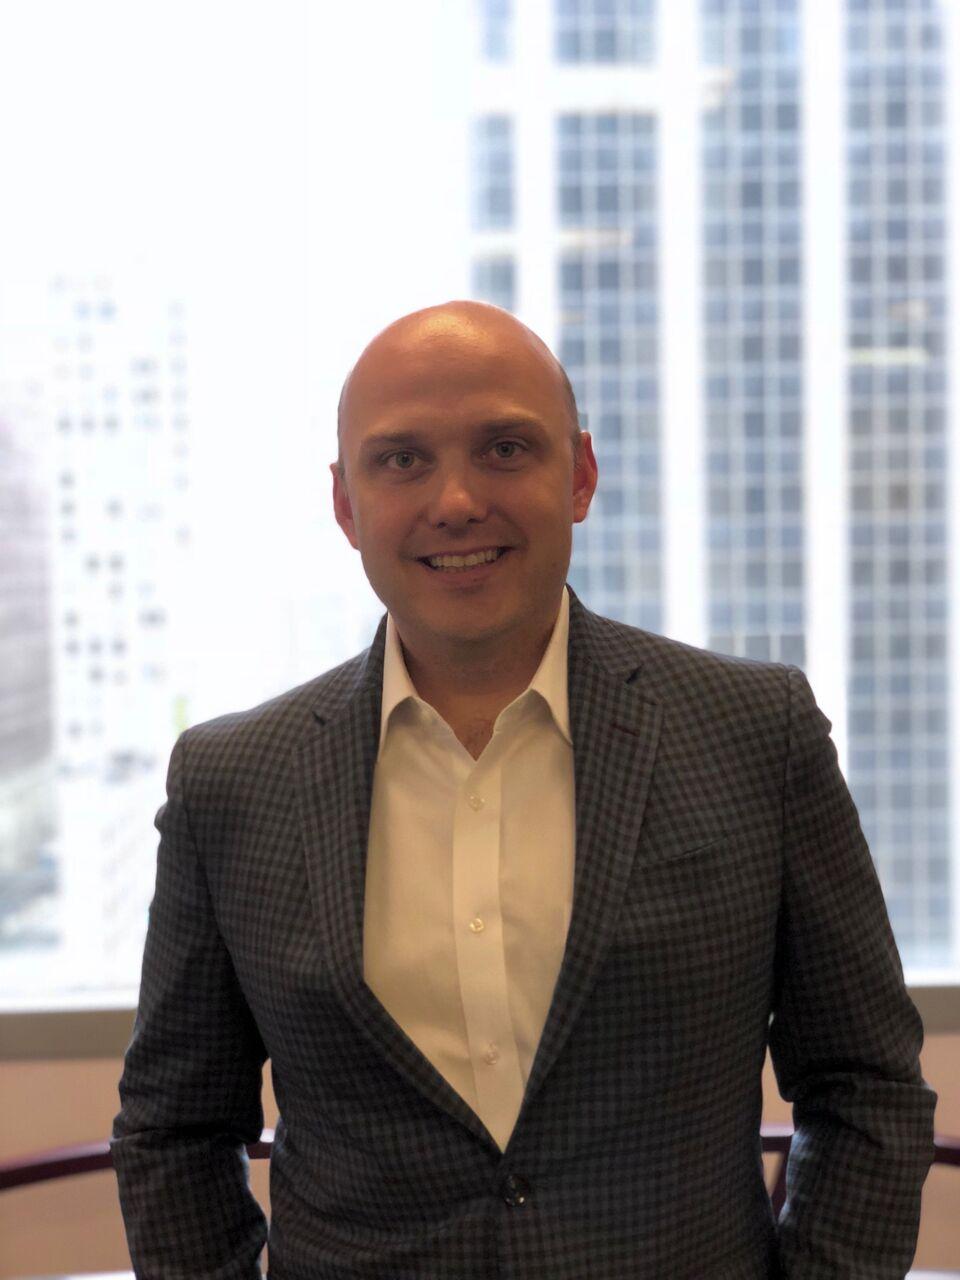 Jason Barsema # Halo Investing